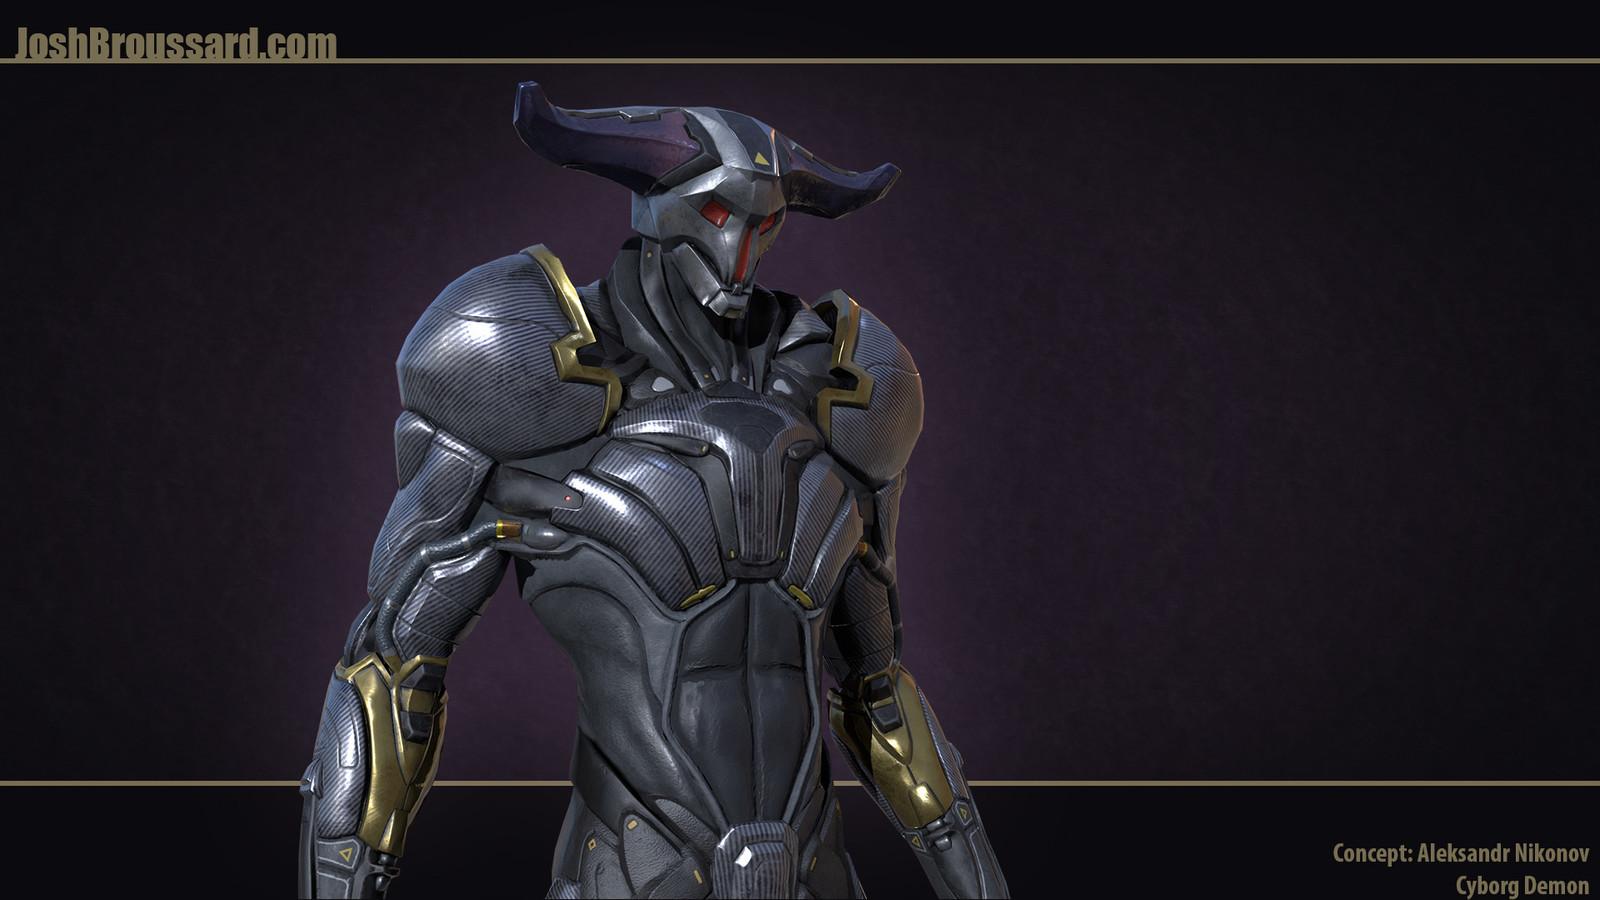 Cyborg Demon